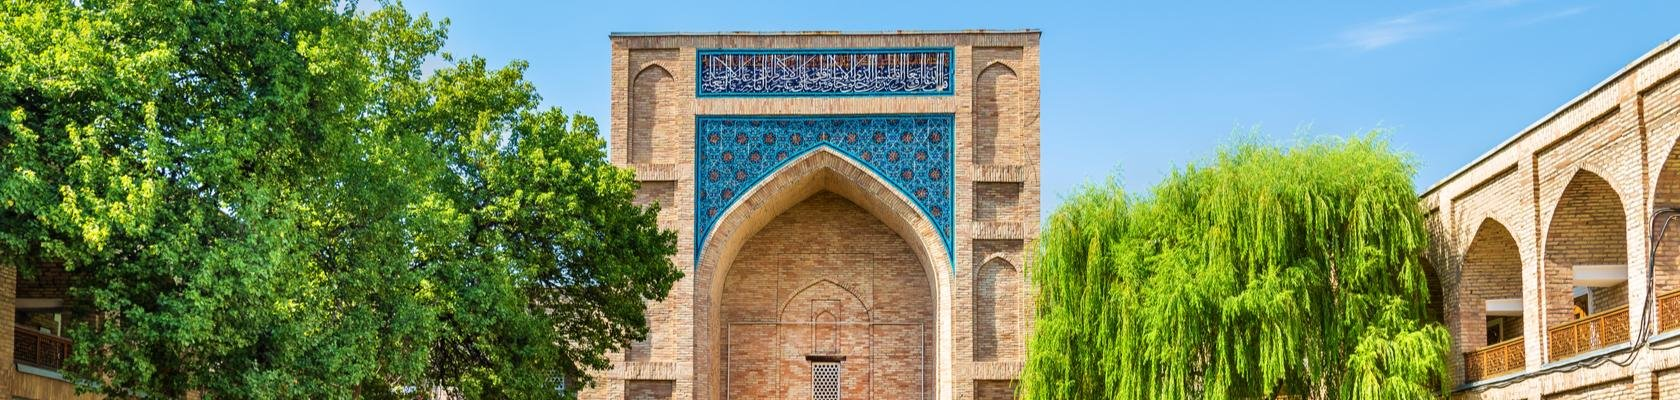 Kukeldash Madrasah, Tasjkent